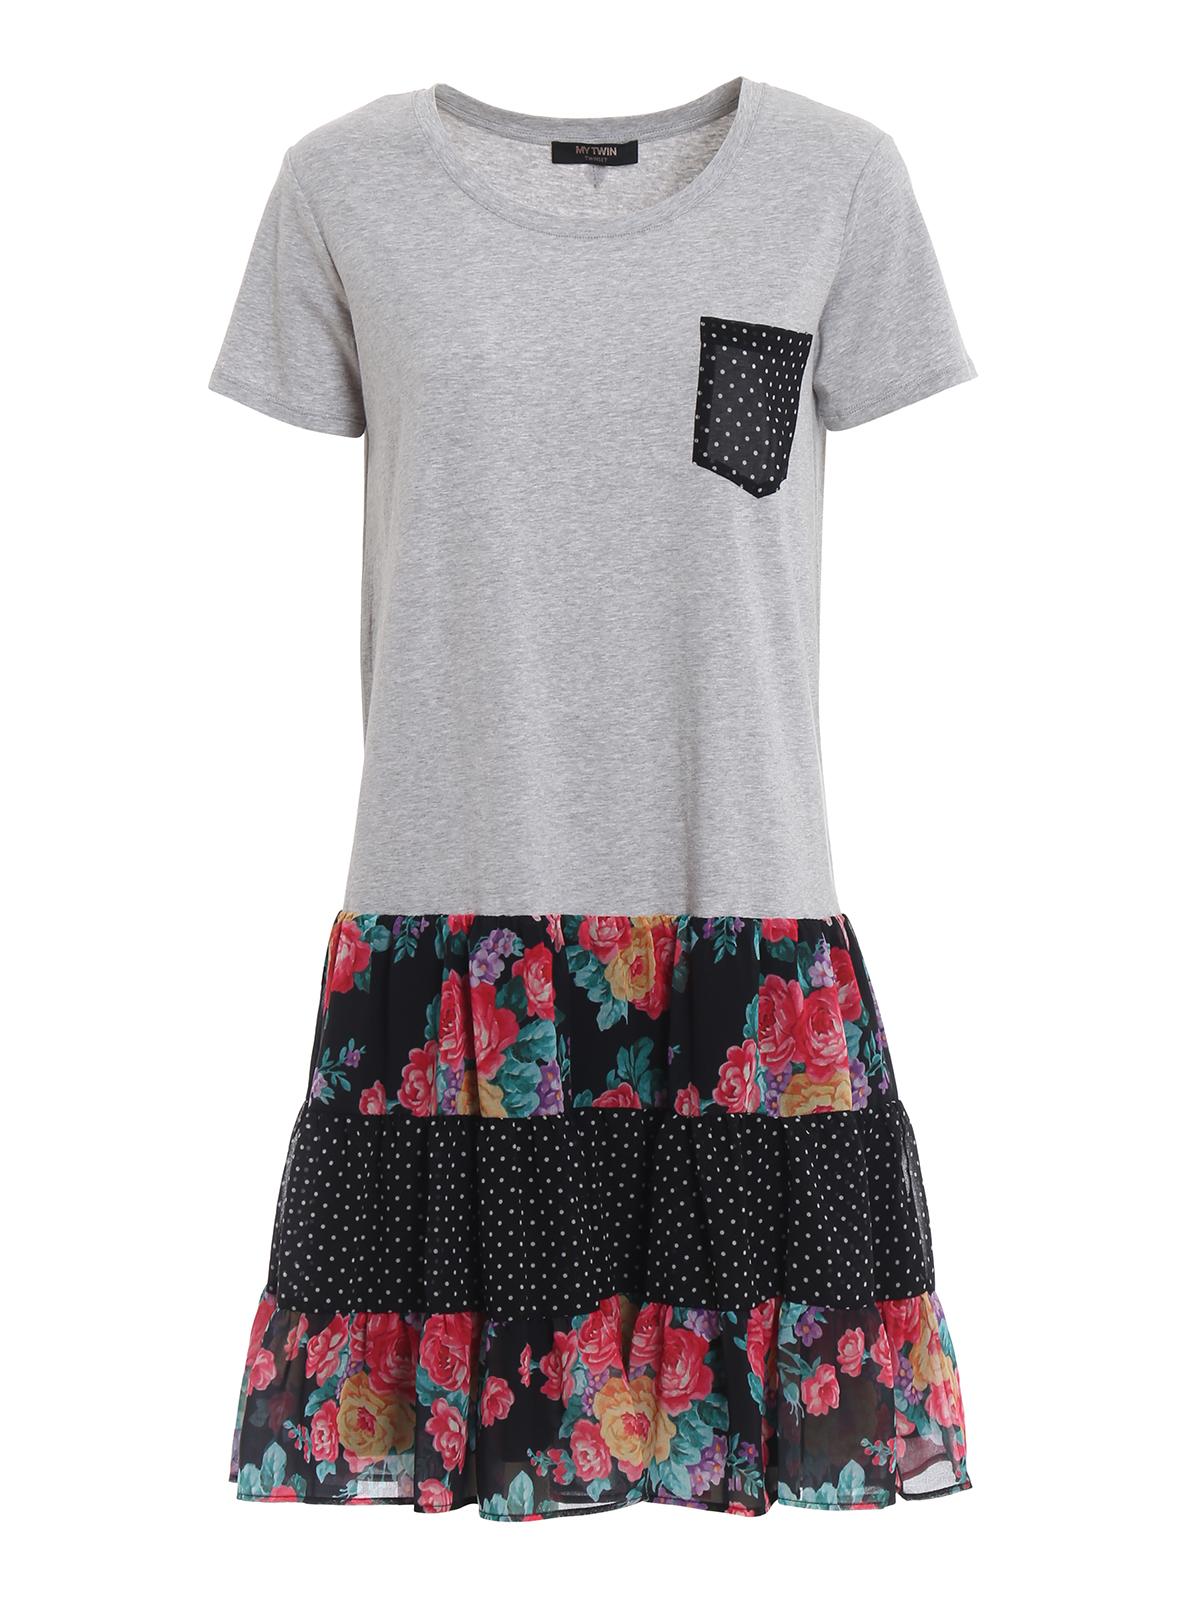 Twinset - Grey stretch cotton T-shirt style short dress ...